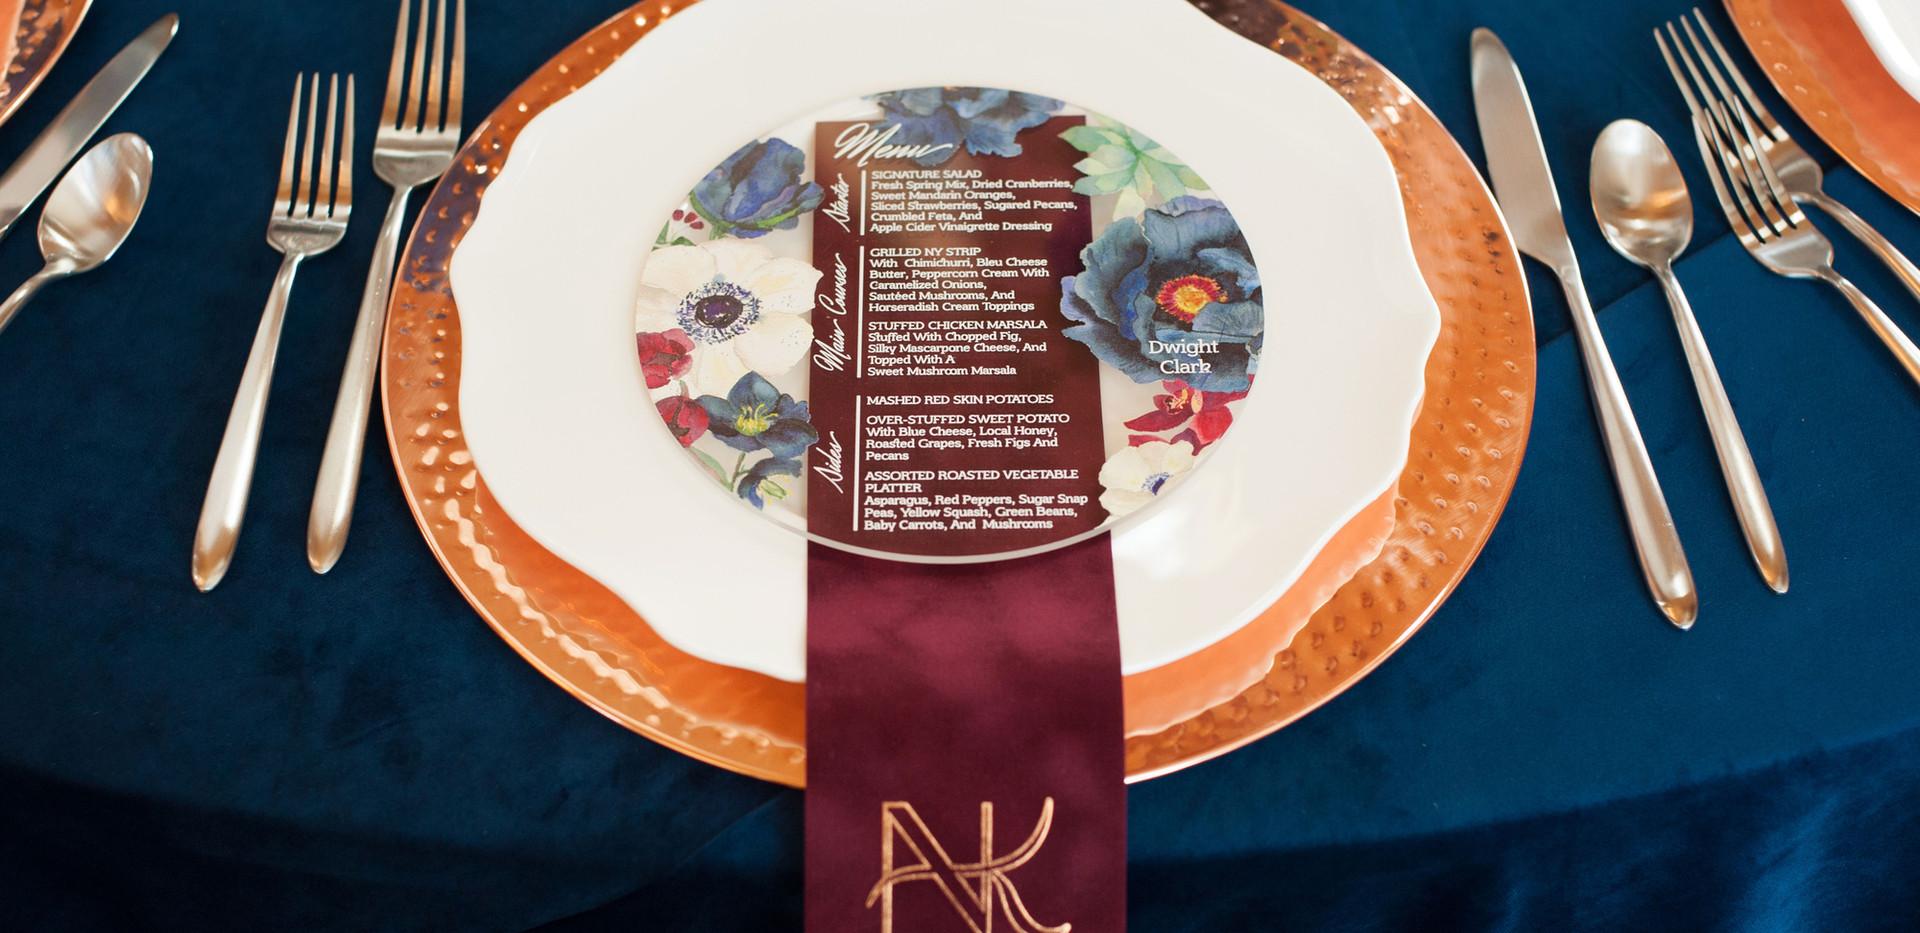 j-char-designs-wedding-menu-floral.jpg